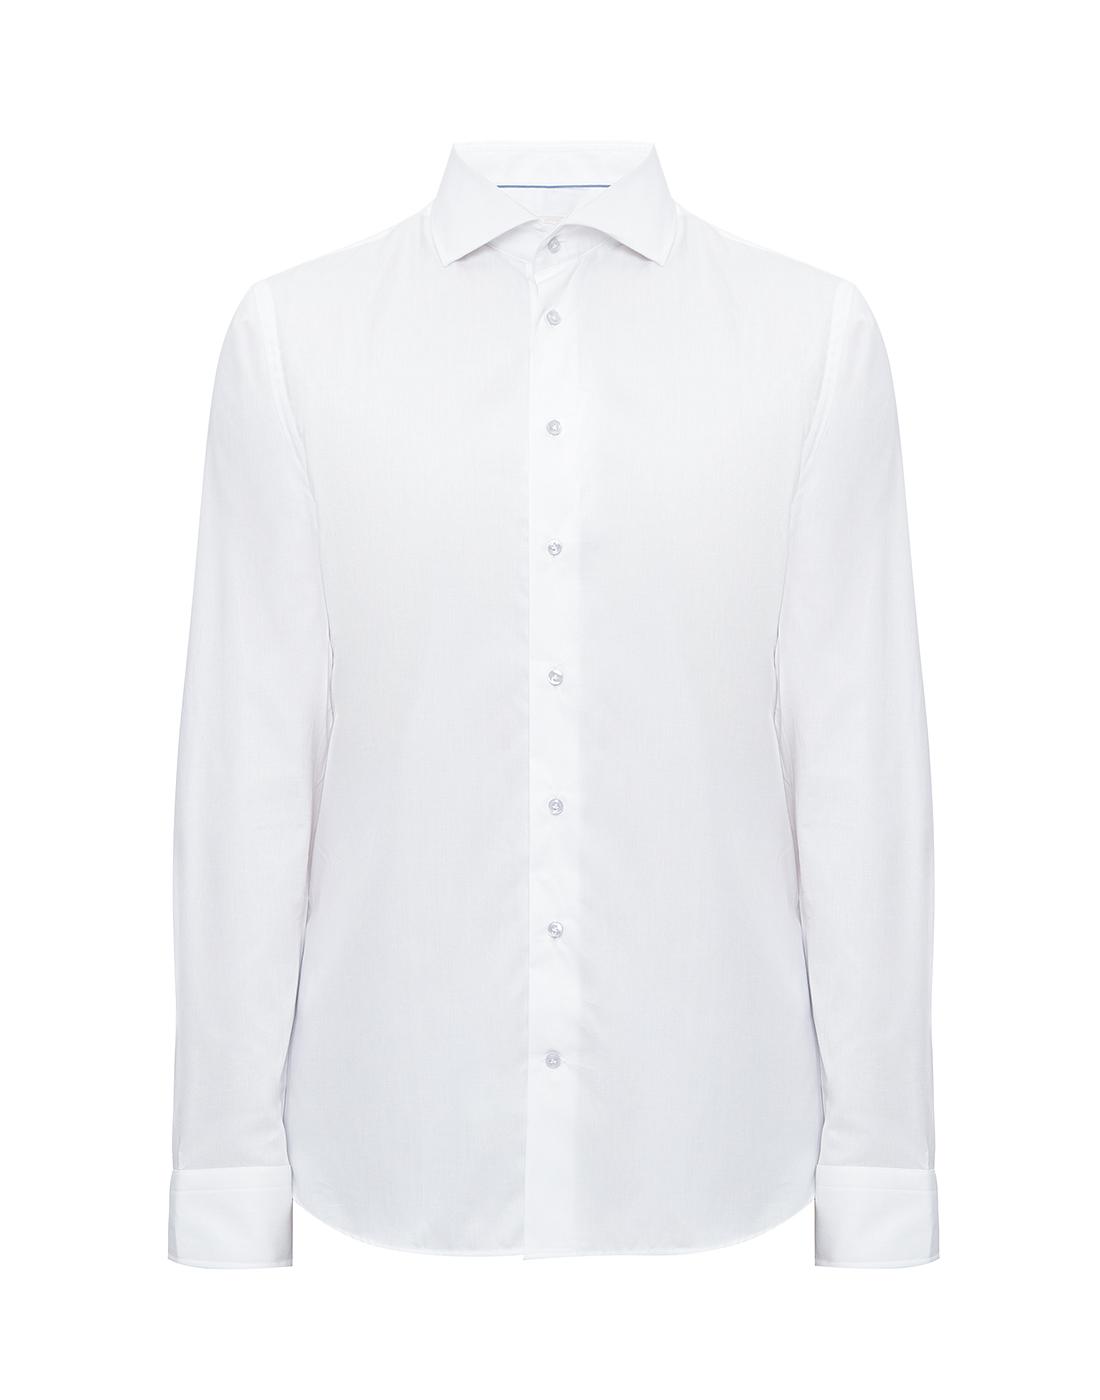 Мужская белая рубашка Profuomo SPPQH1C1002-1